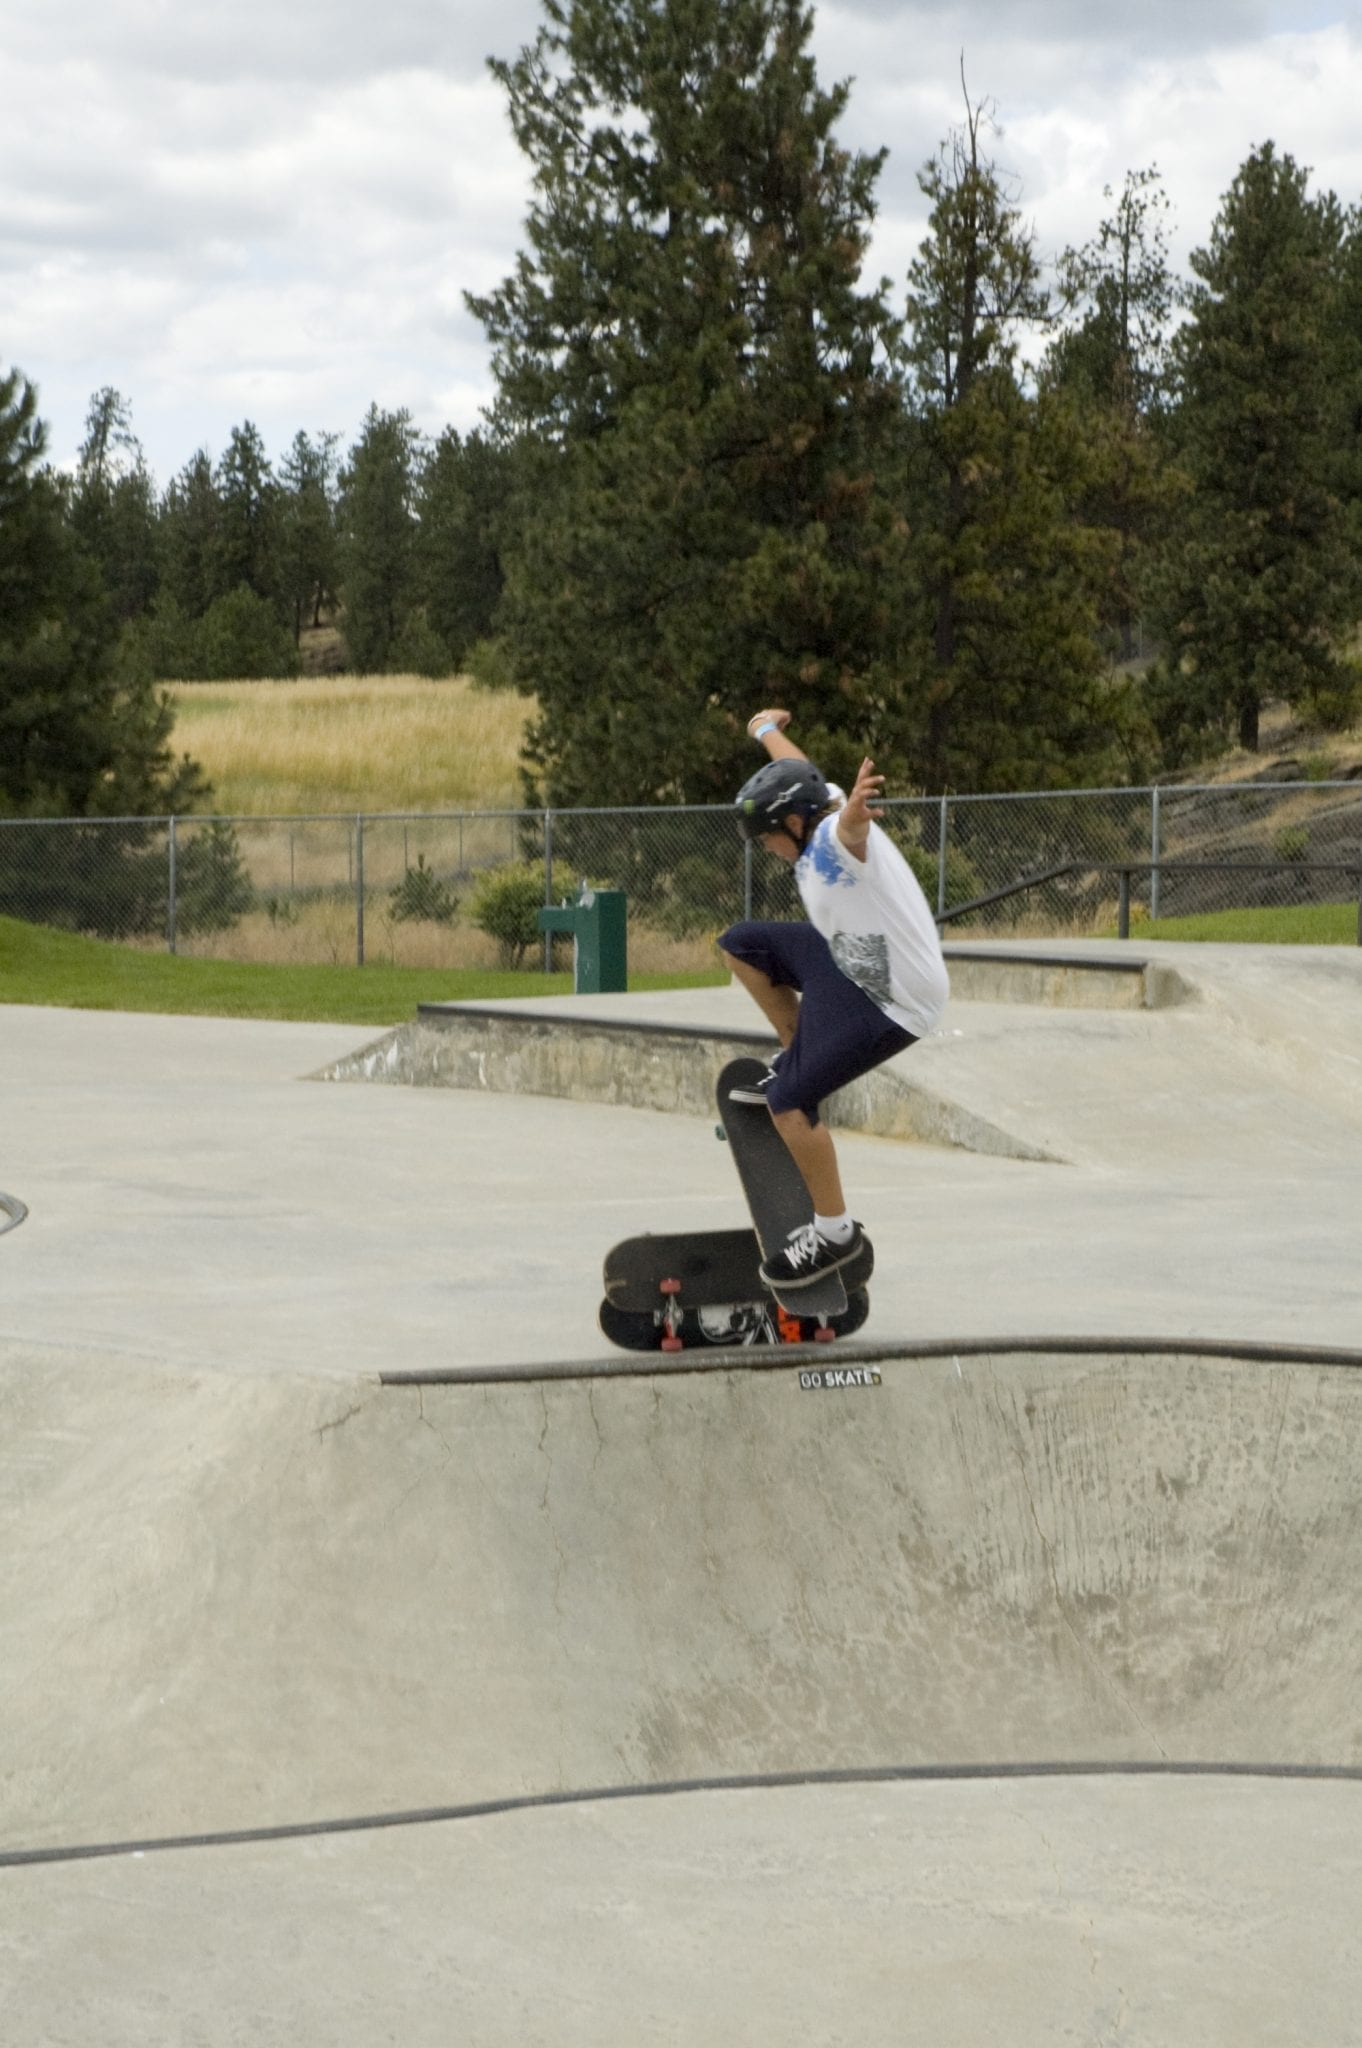 Valley Y Skate Park